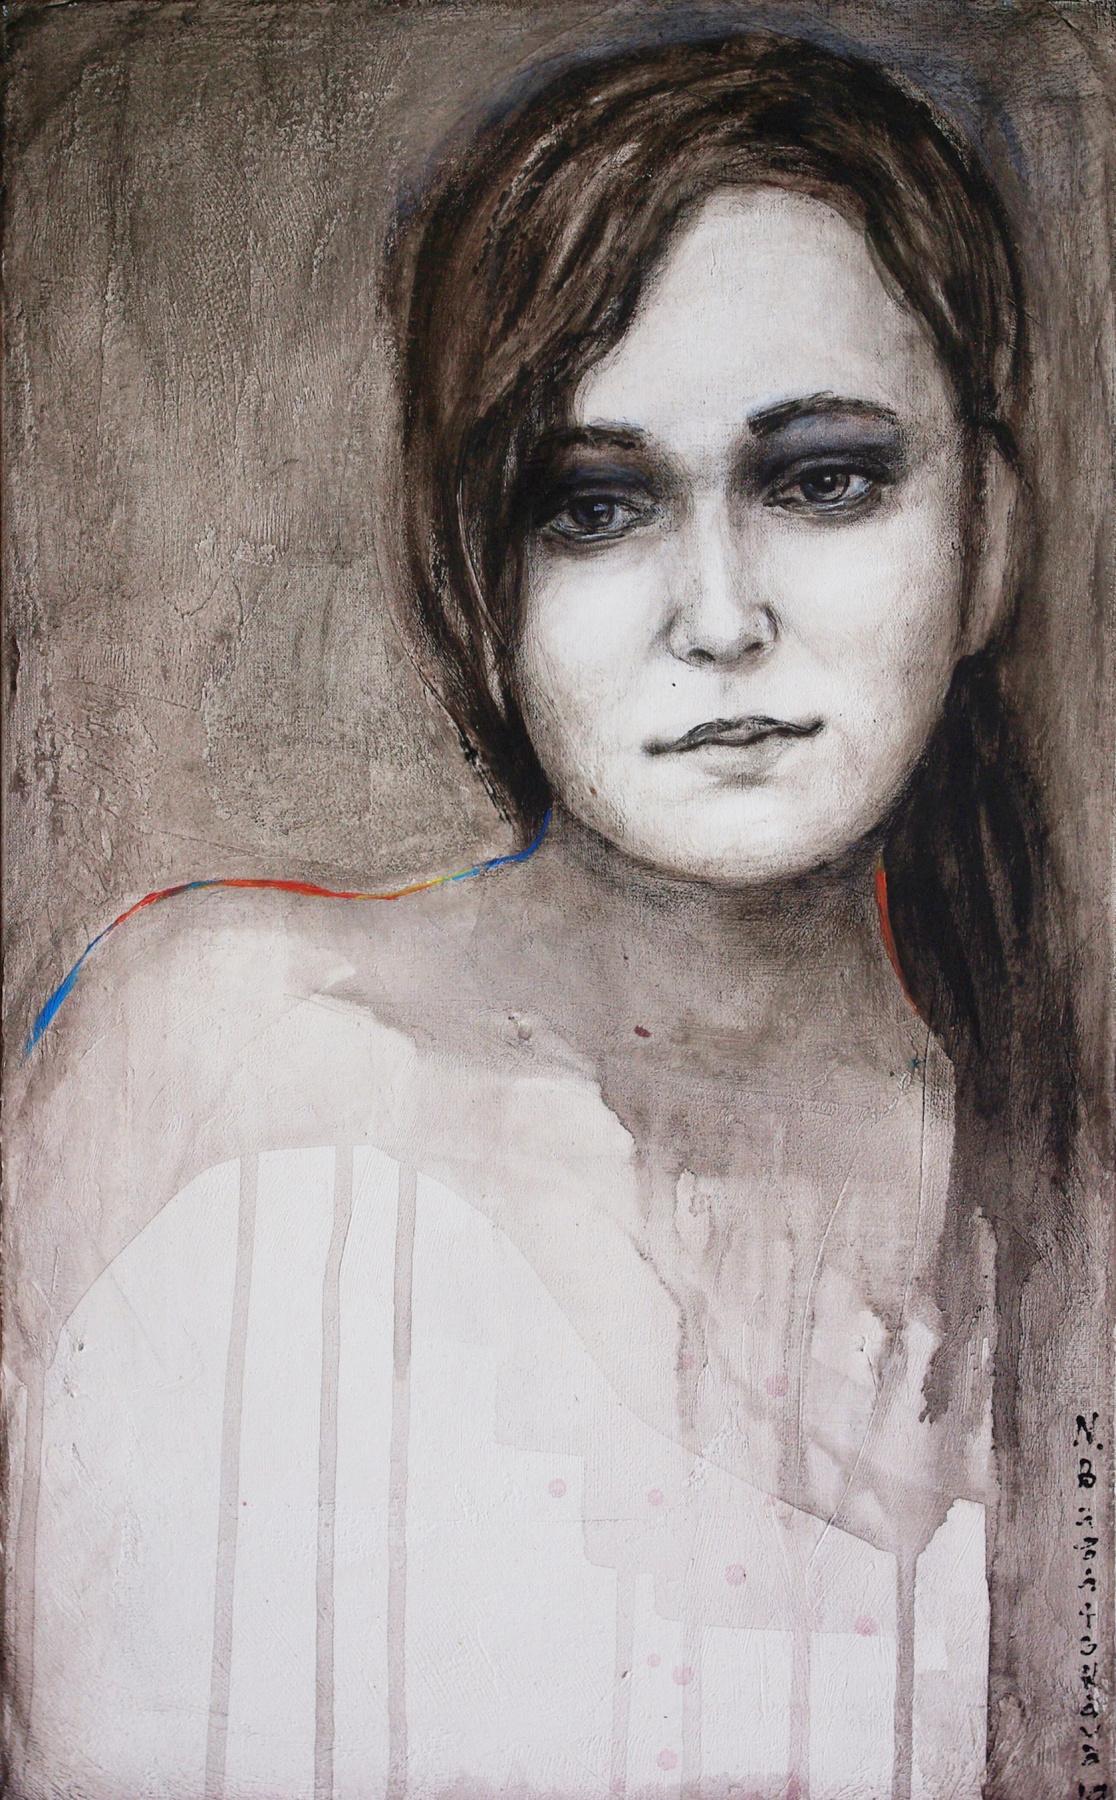 Natalia Bagatskaya. Portrait of a girl in grisaille